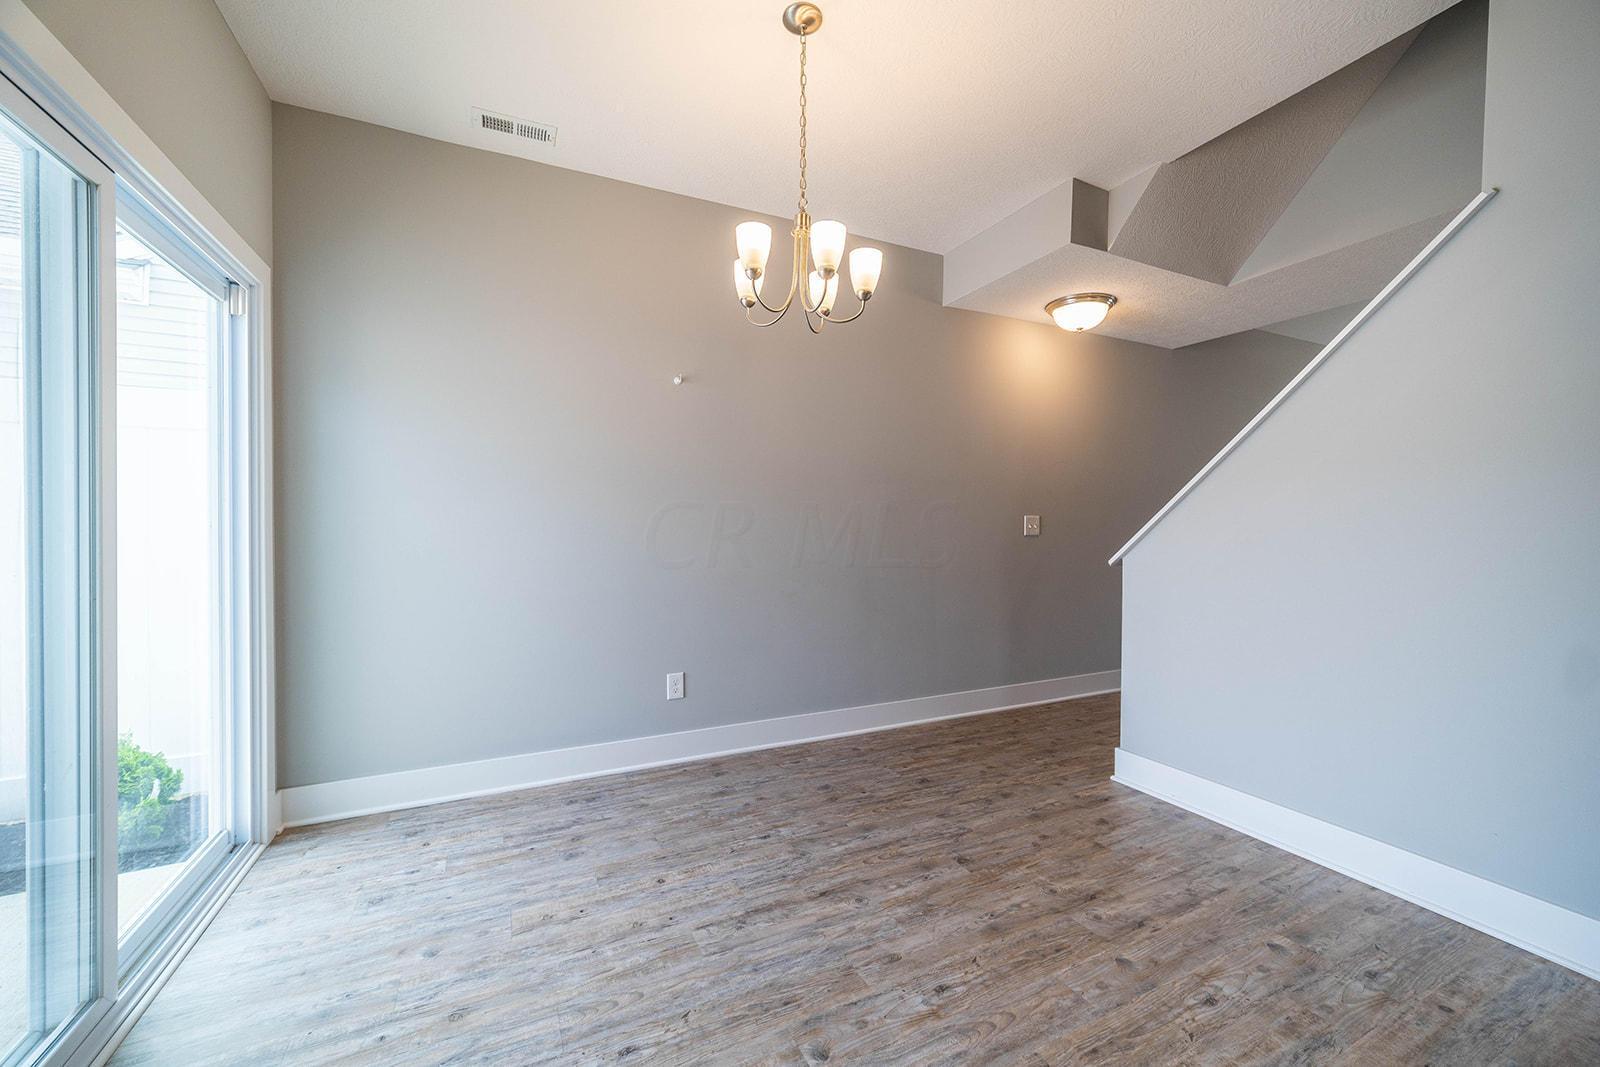 1988 Edison Street, Newark, Ohio 43055, 3 Bedrooms Bedrooms, ,3 BathroomsBathrooms,Residential,For Sale,Edison,220032272